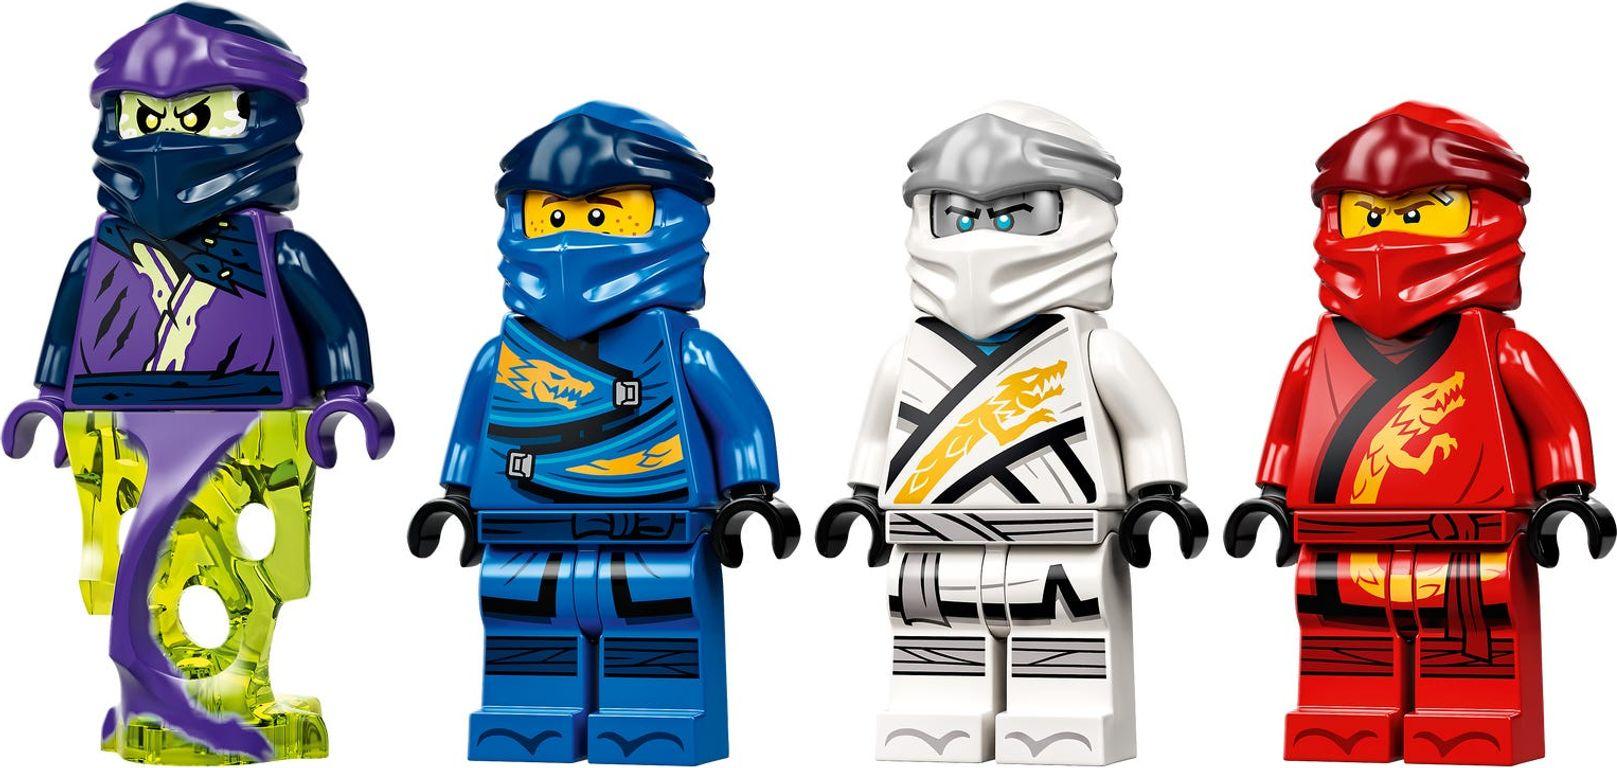 LEGO® Ninjago Final Flight of Destiny's Bounty minifigures